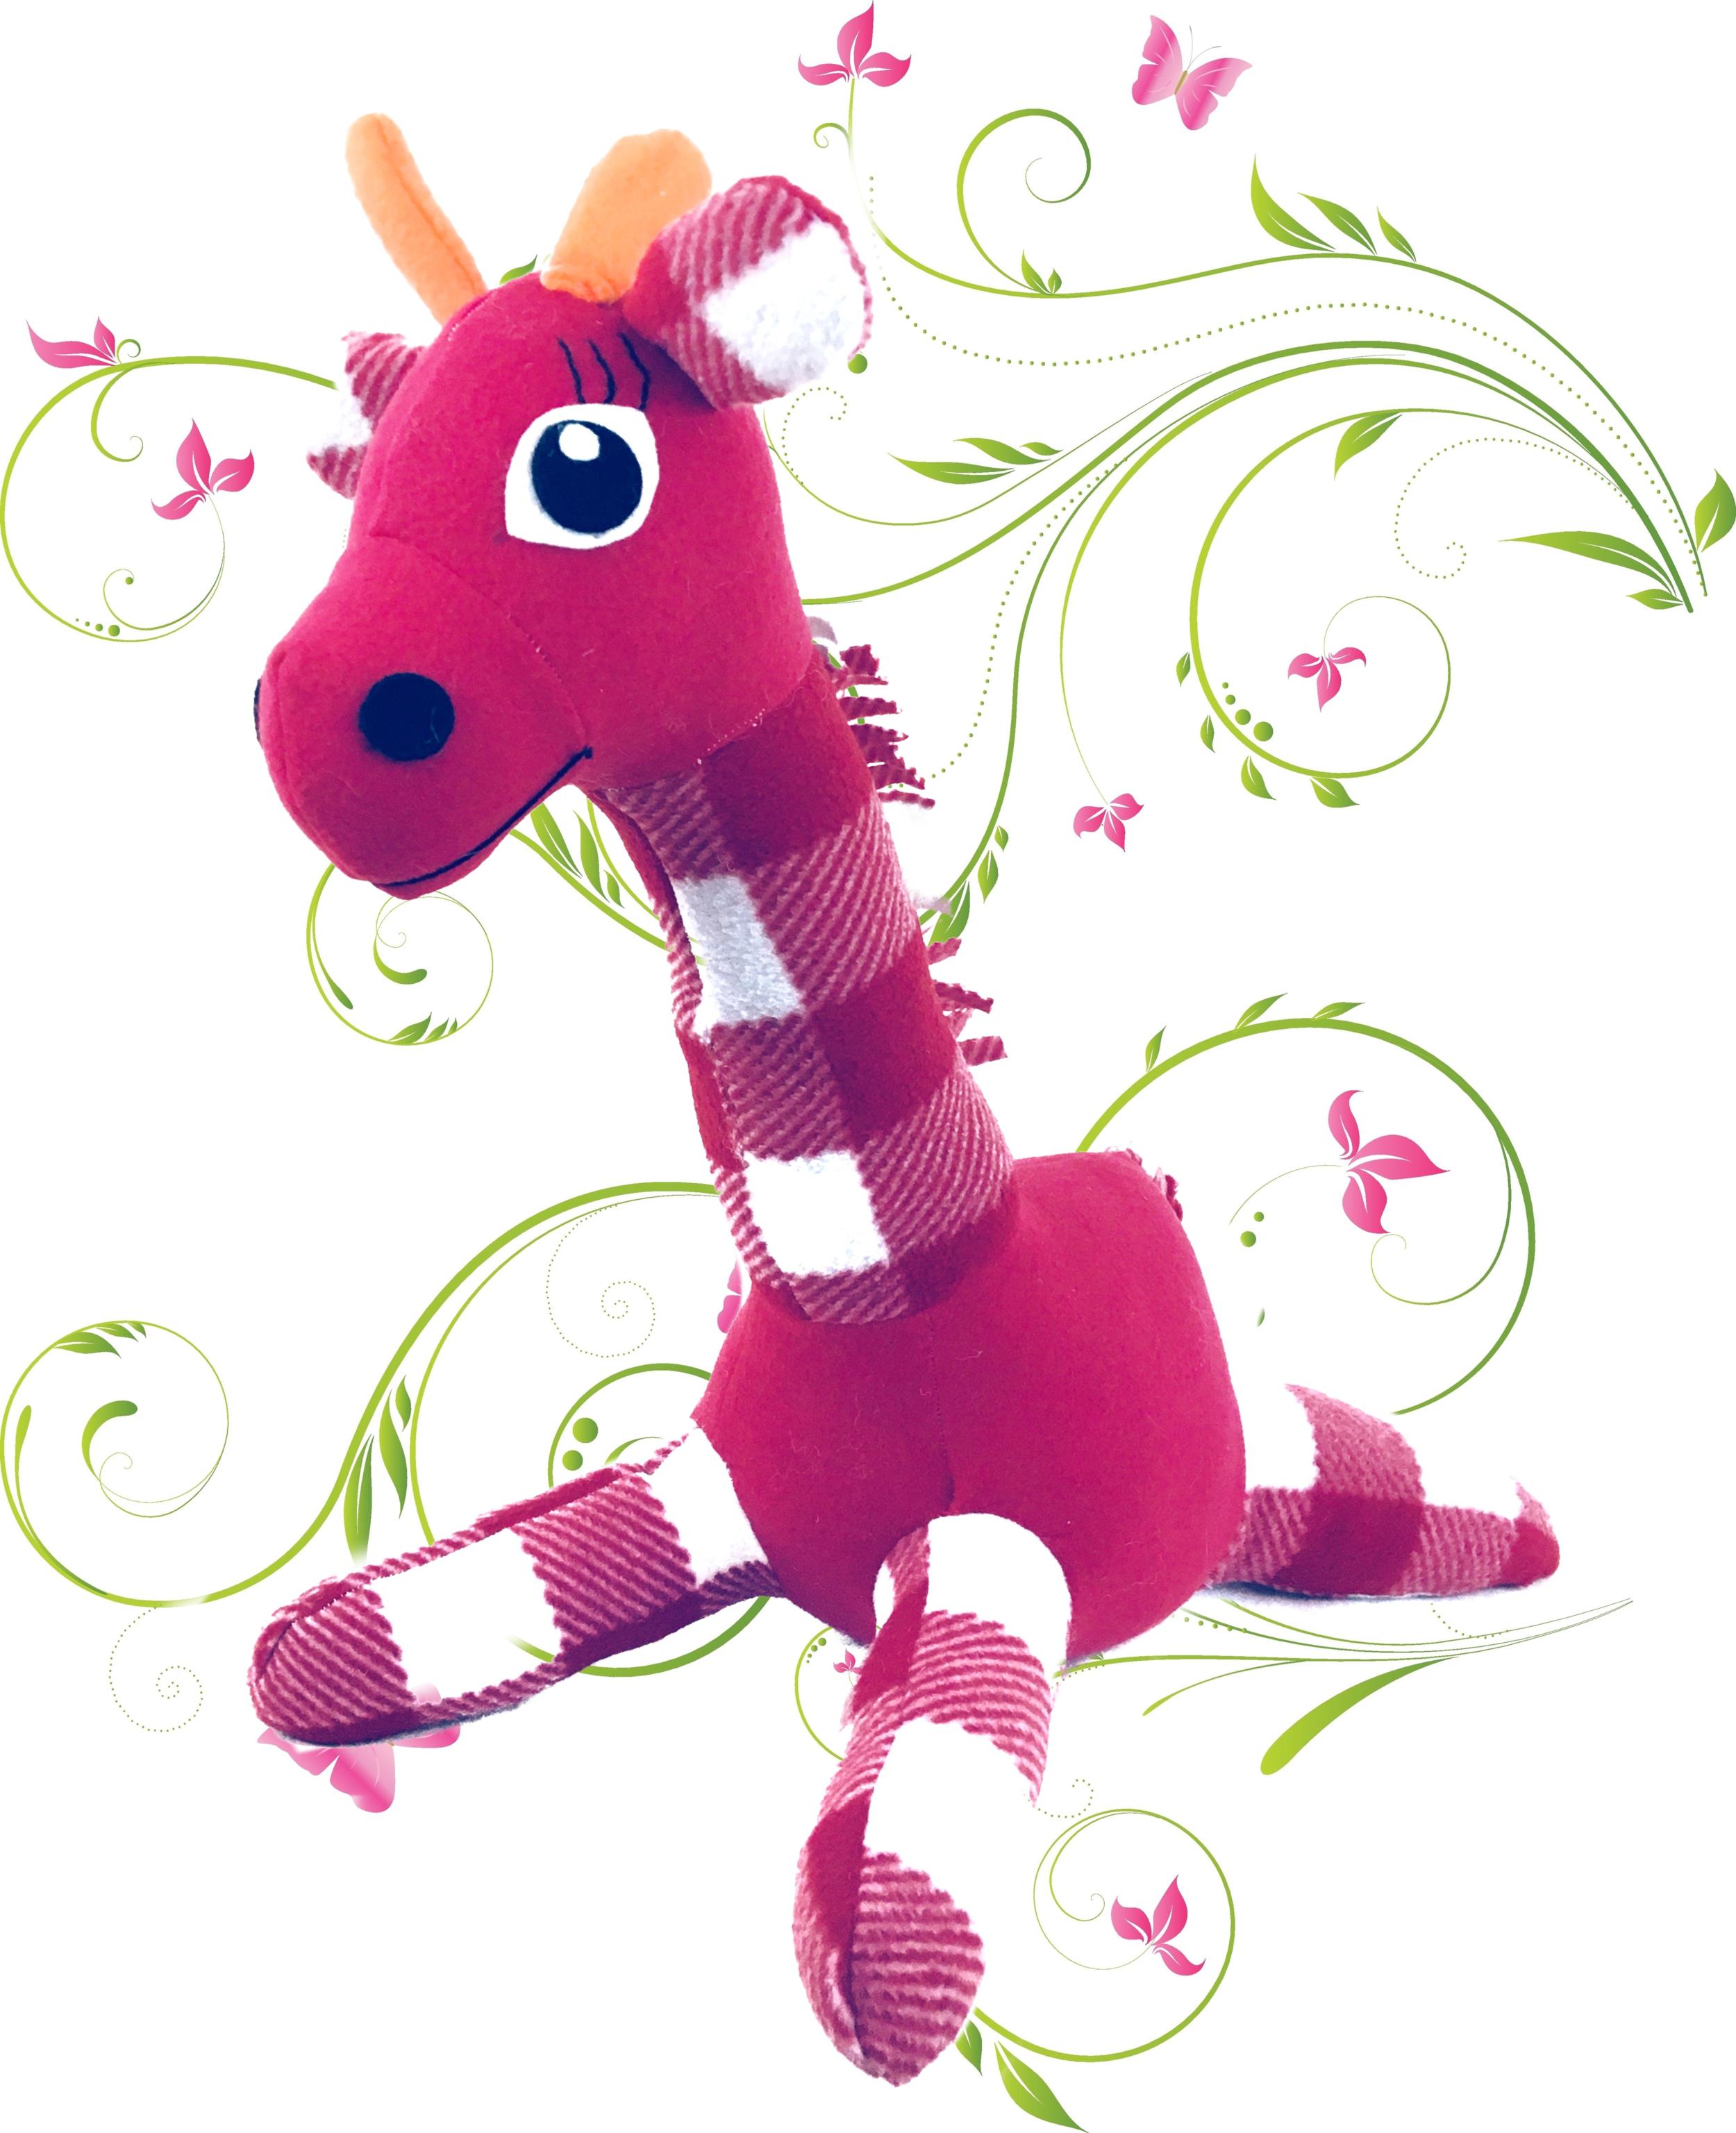 giraffe pattern.PNG